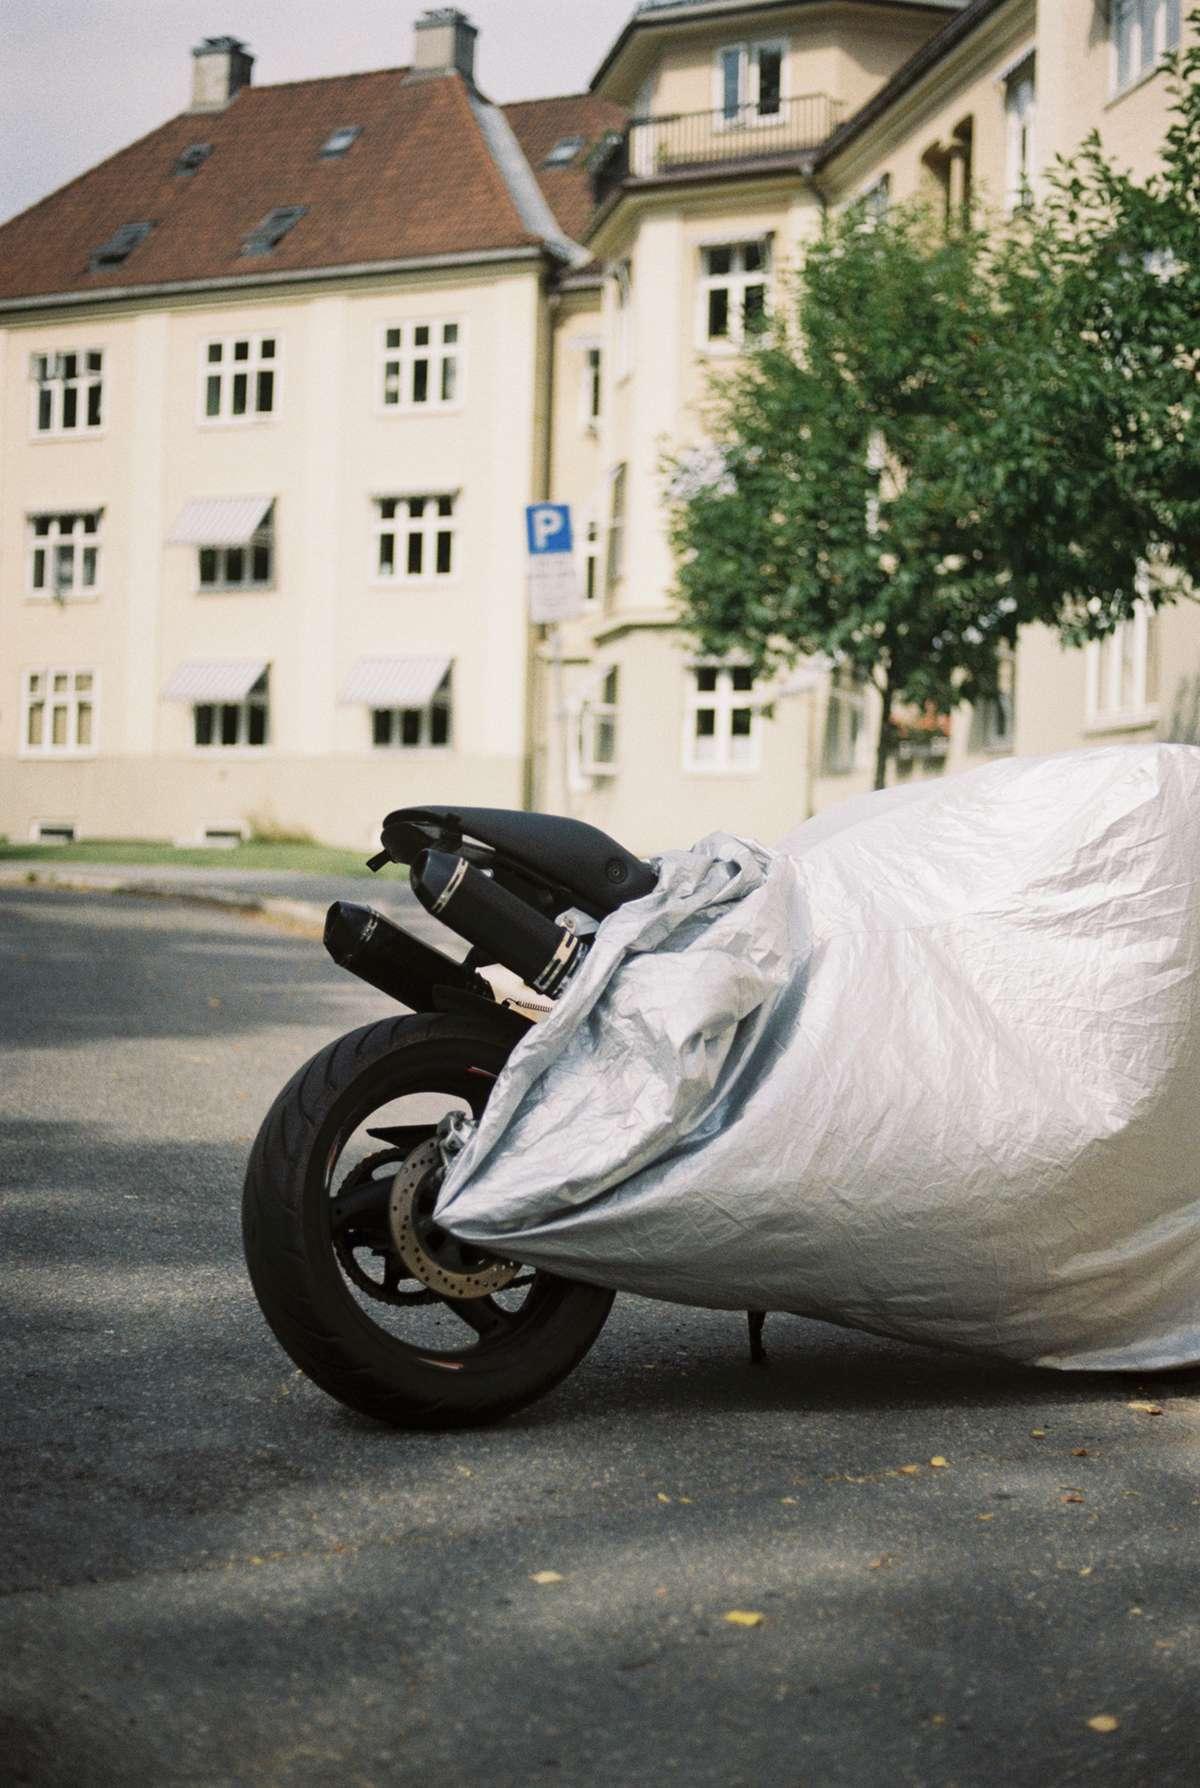 Motorsykkel uten registreringsnummer. Foto.